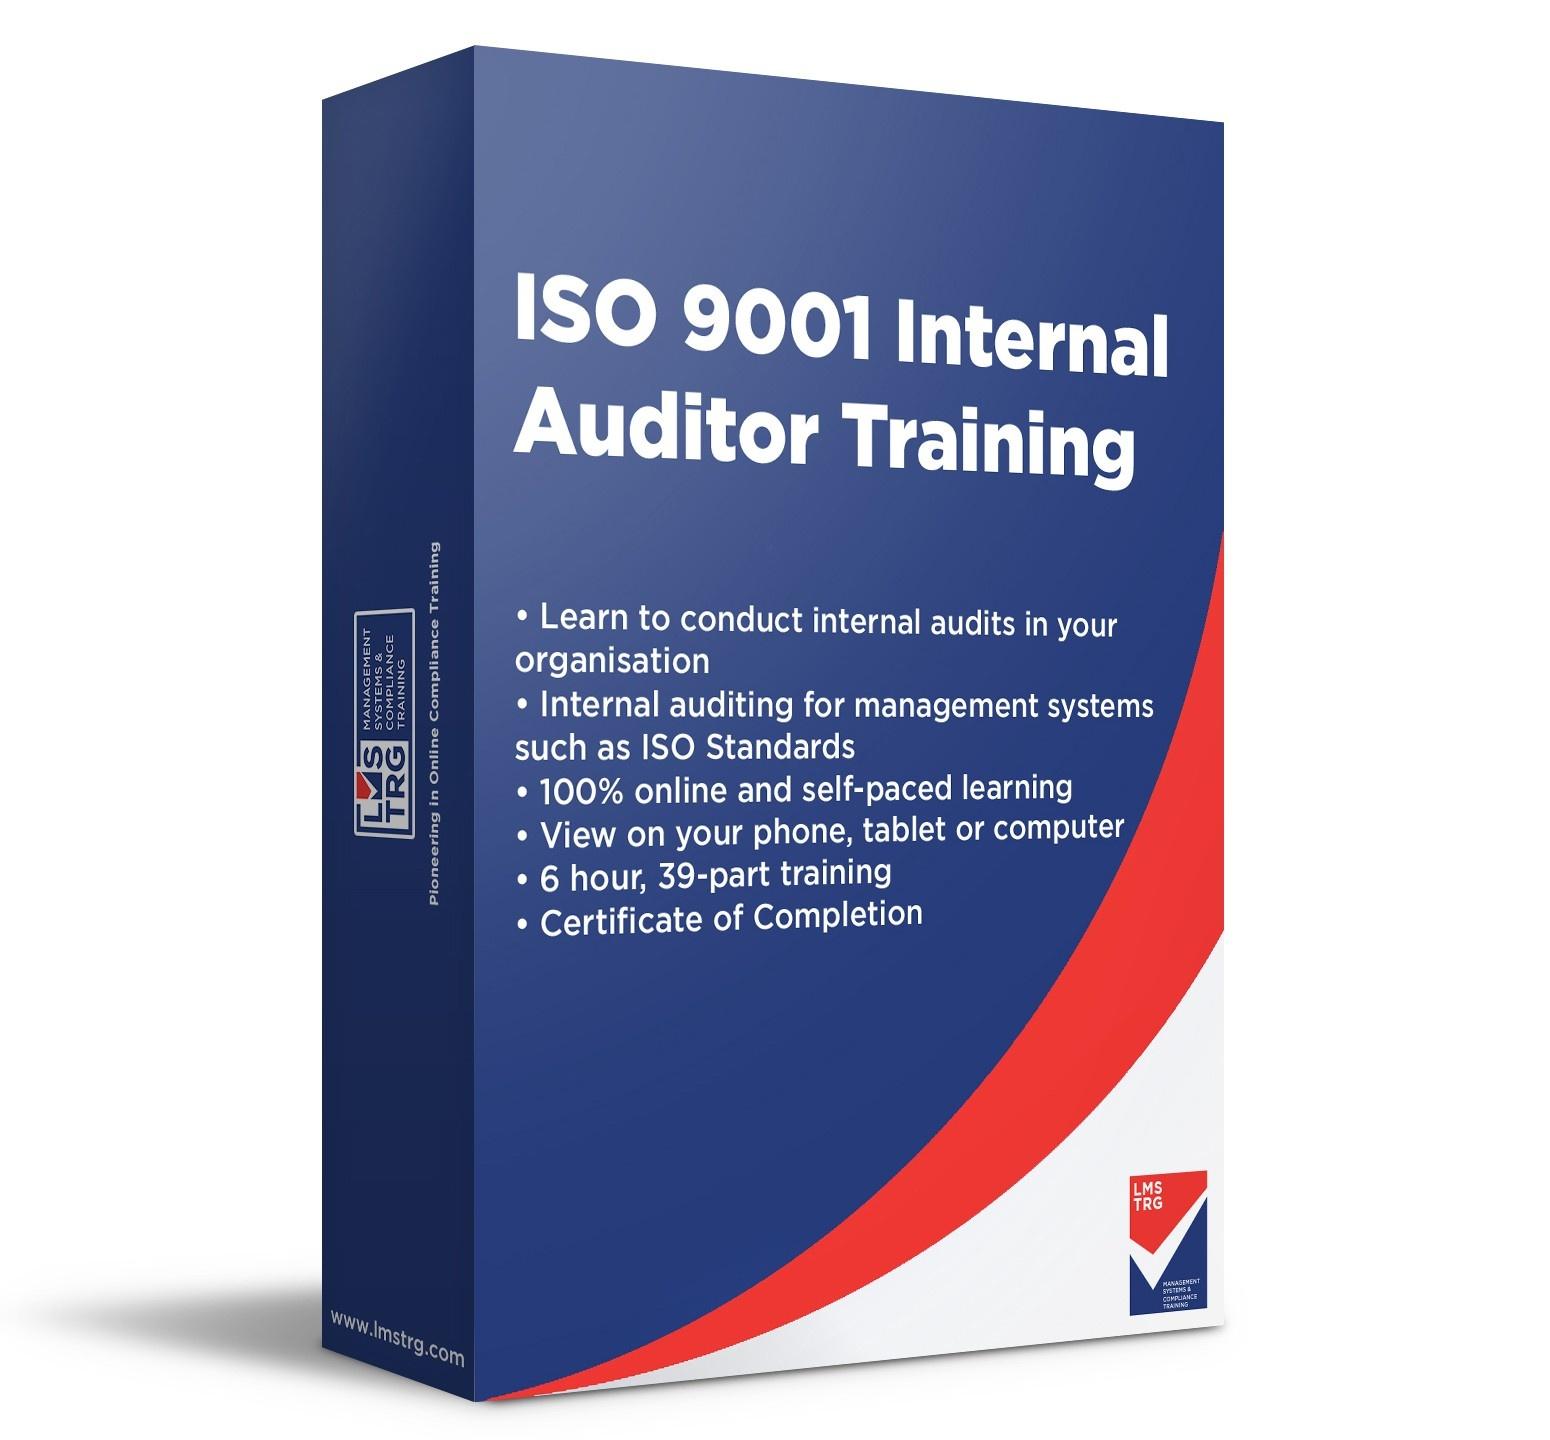 Internal Auditor Training for Beginners